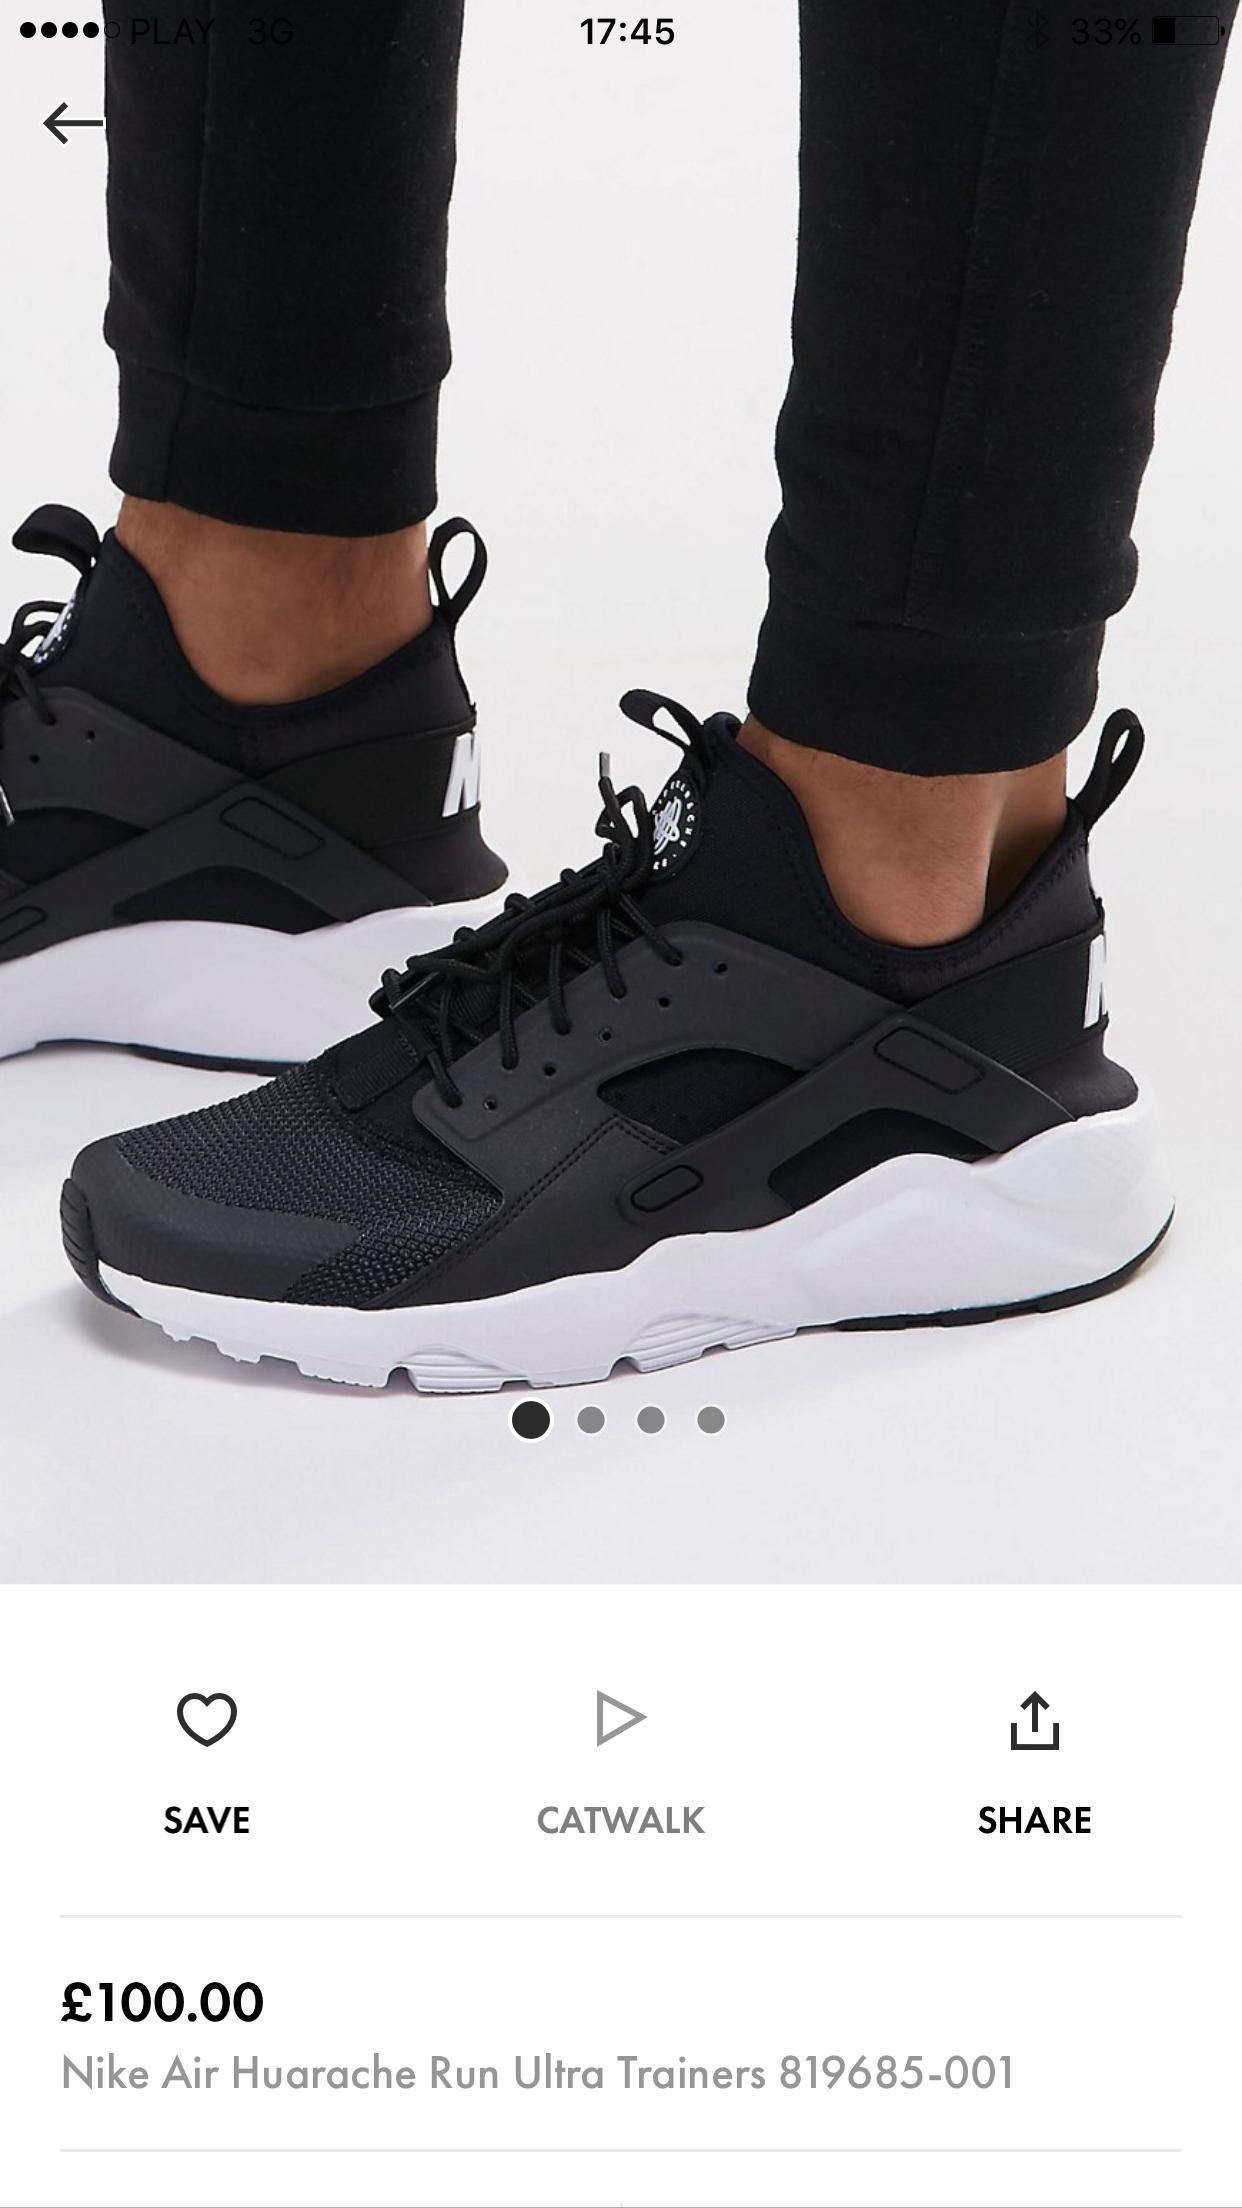 super popular 41f41 3f89f Black Sneakers, Black Shoes, Men s Sneakers, Nike Air Huarache, Nike Roshe  Run